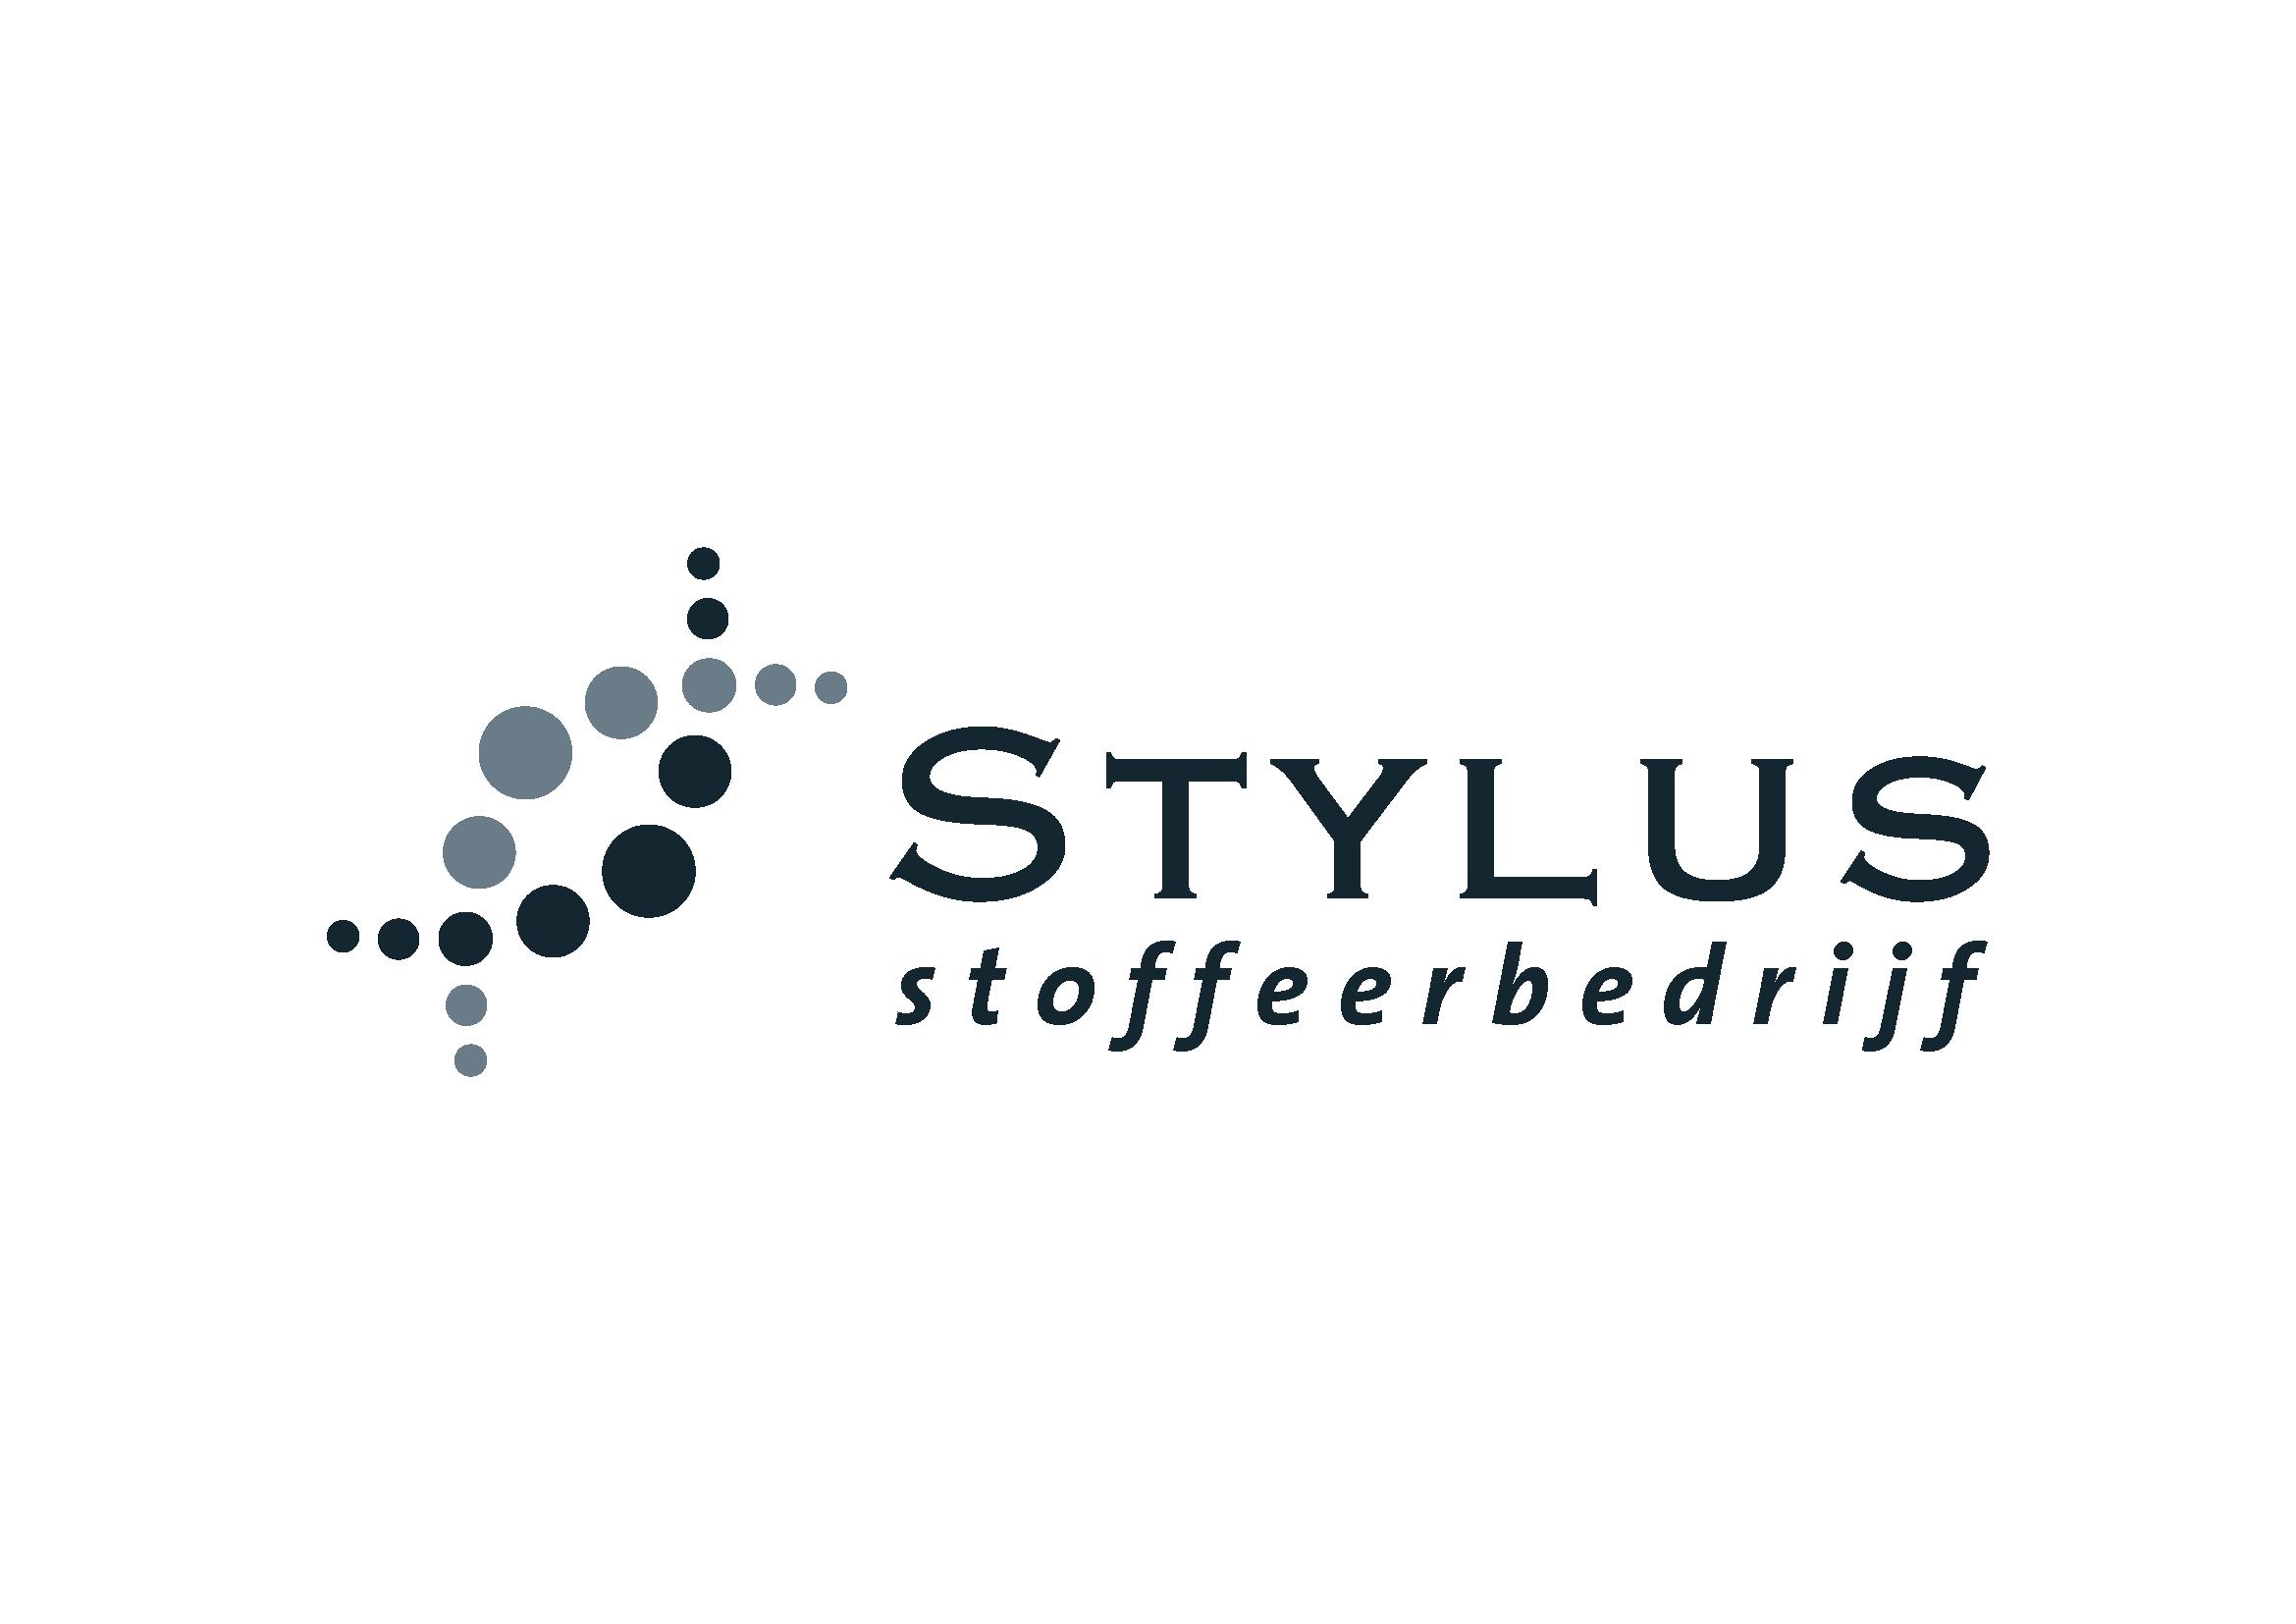 24 Stylus - logo